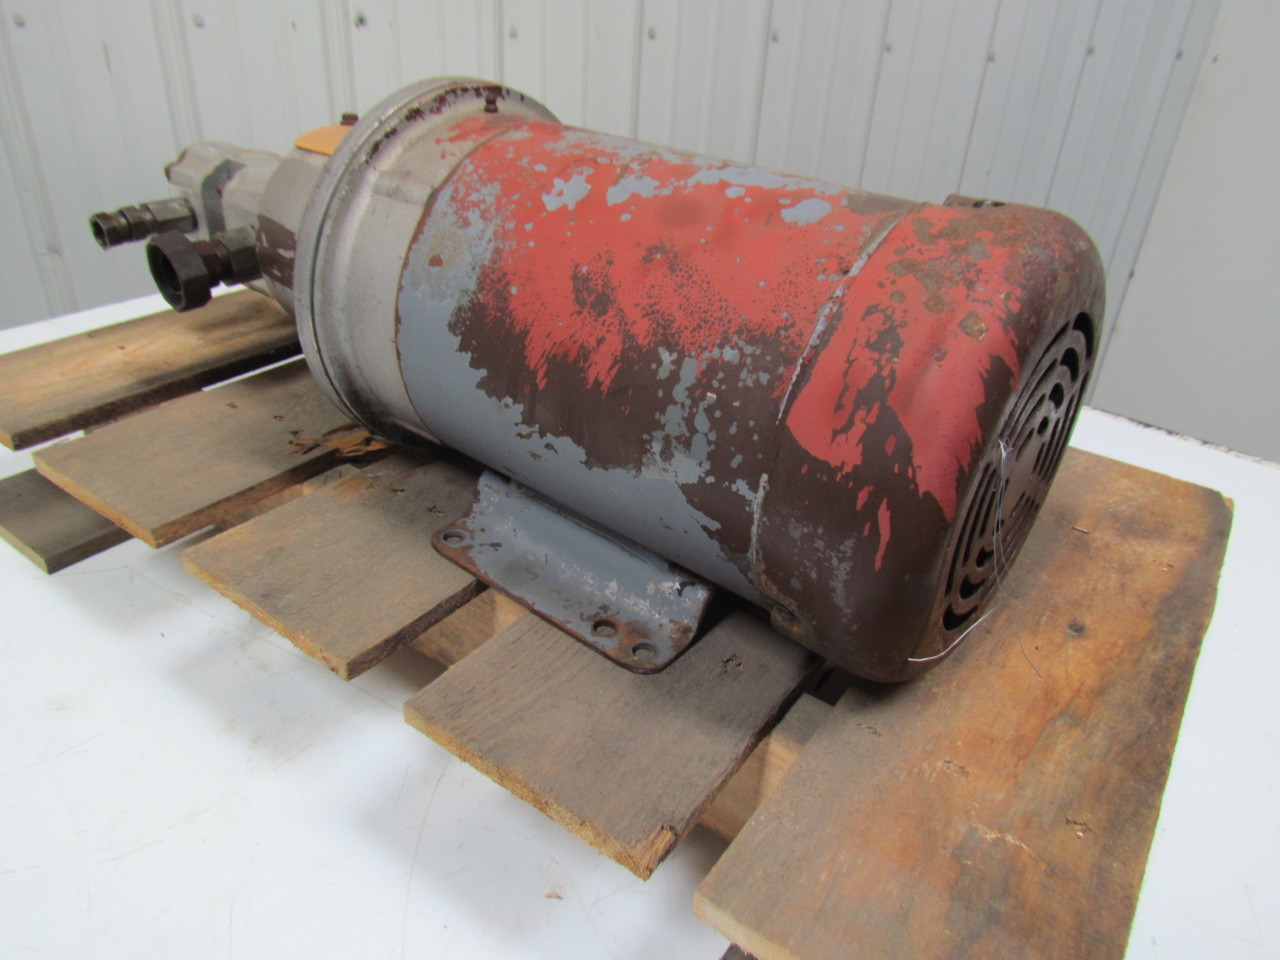 Baldor cm3615t electric motor 5hp 3ph 1750rpm 184tc frame for 5hp 3ph electric motor